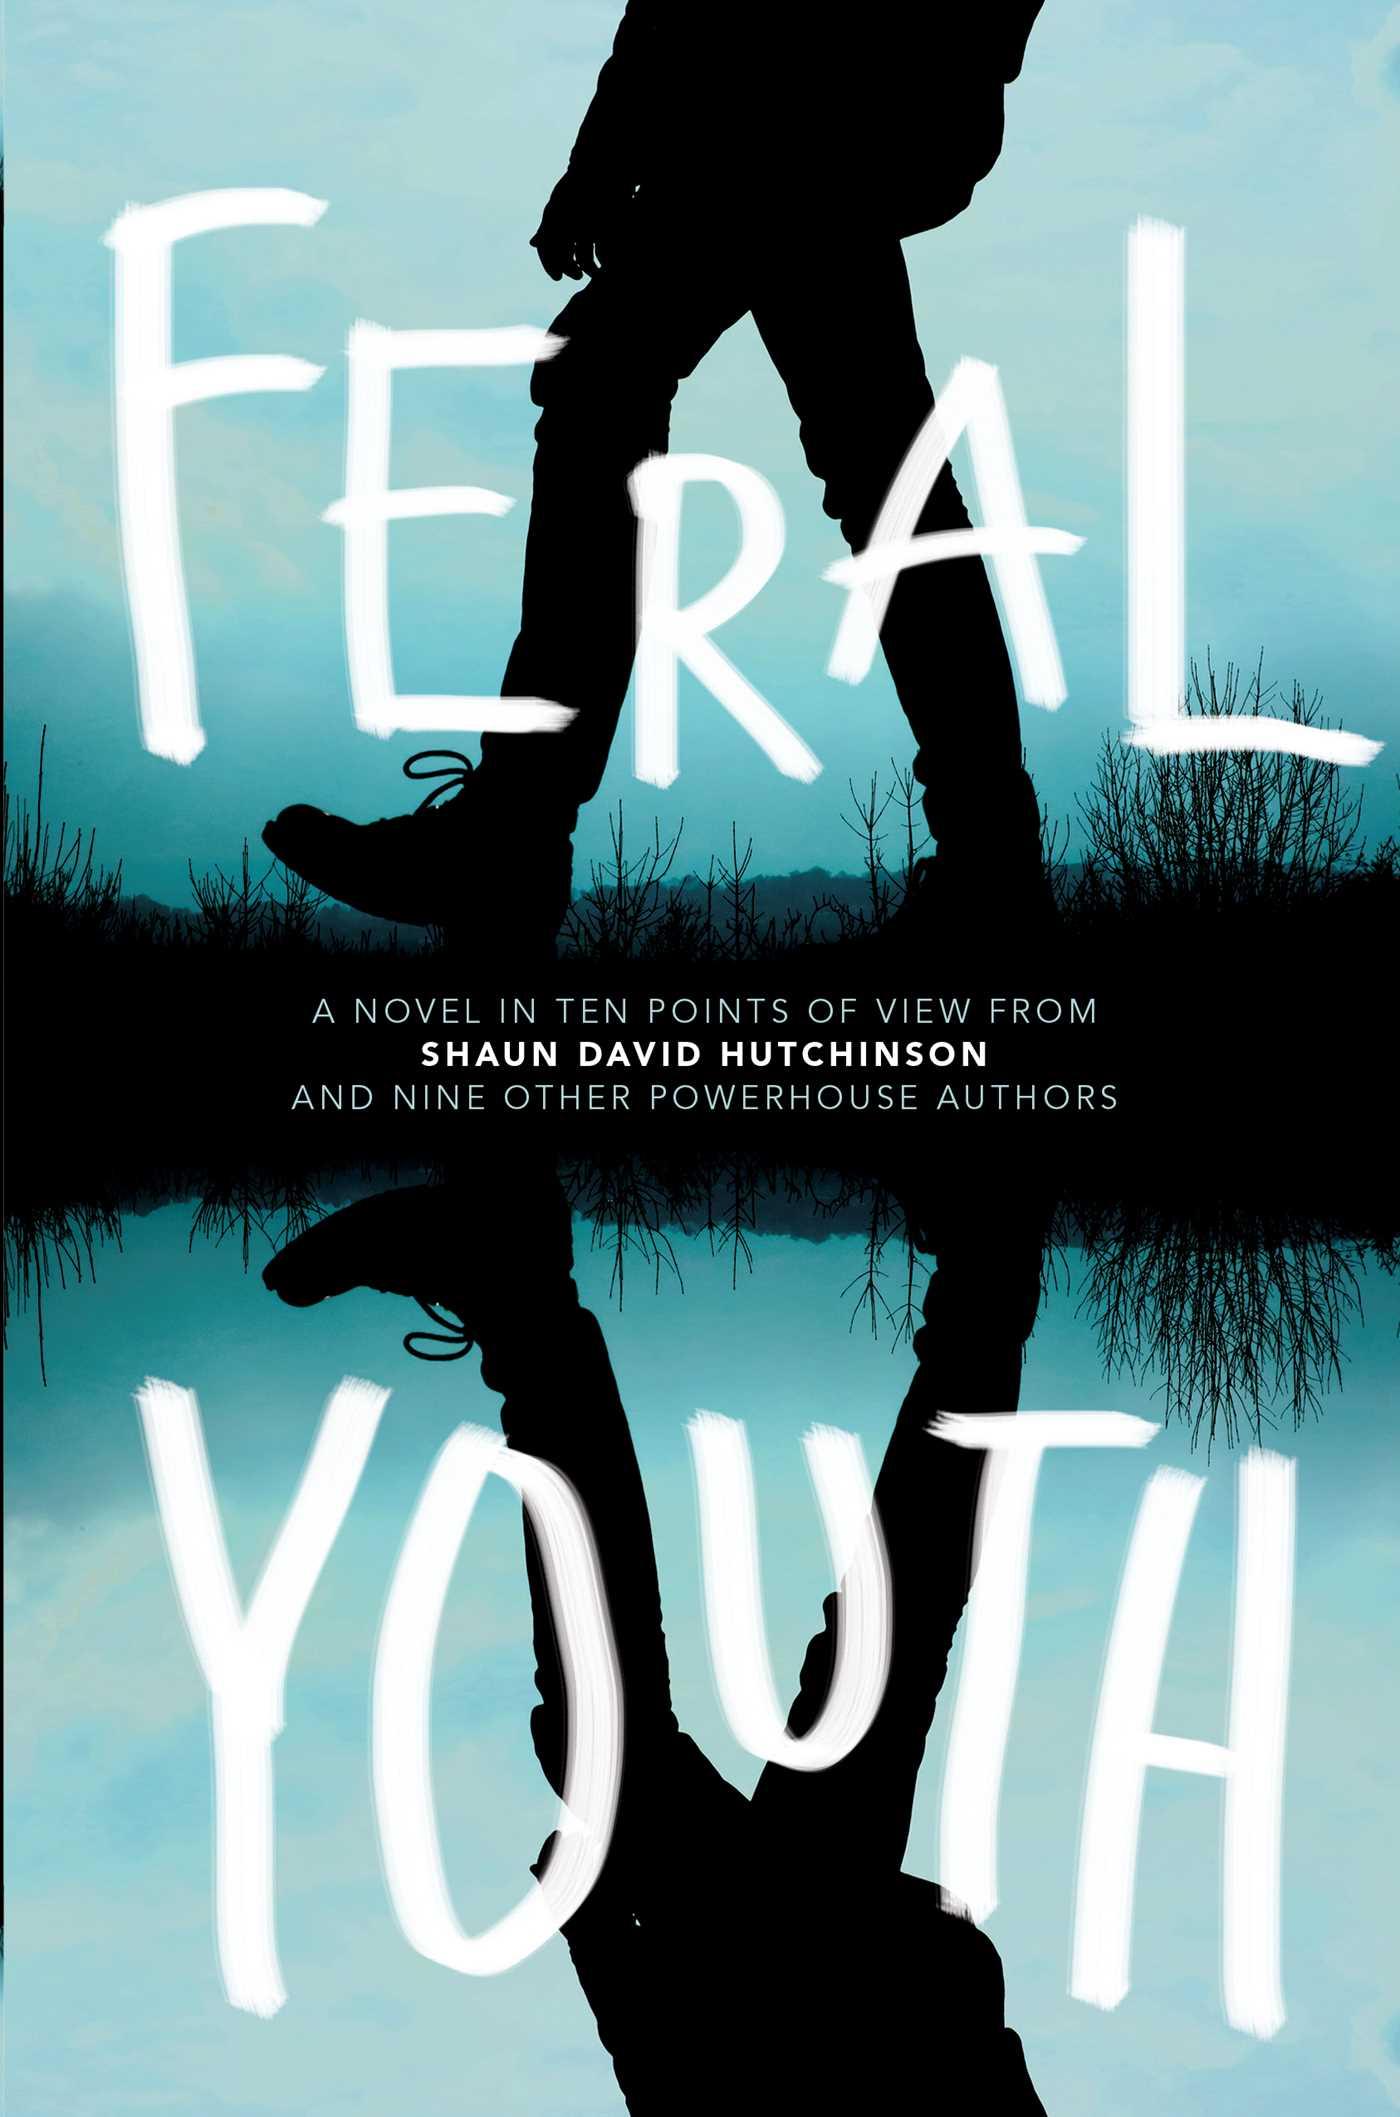 Feral youth 9781481491136 hr